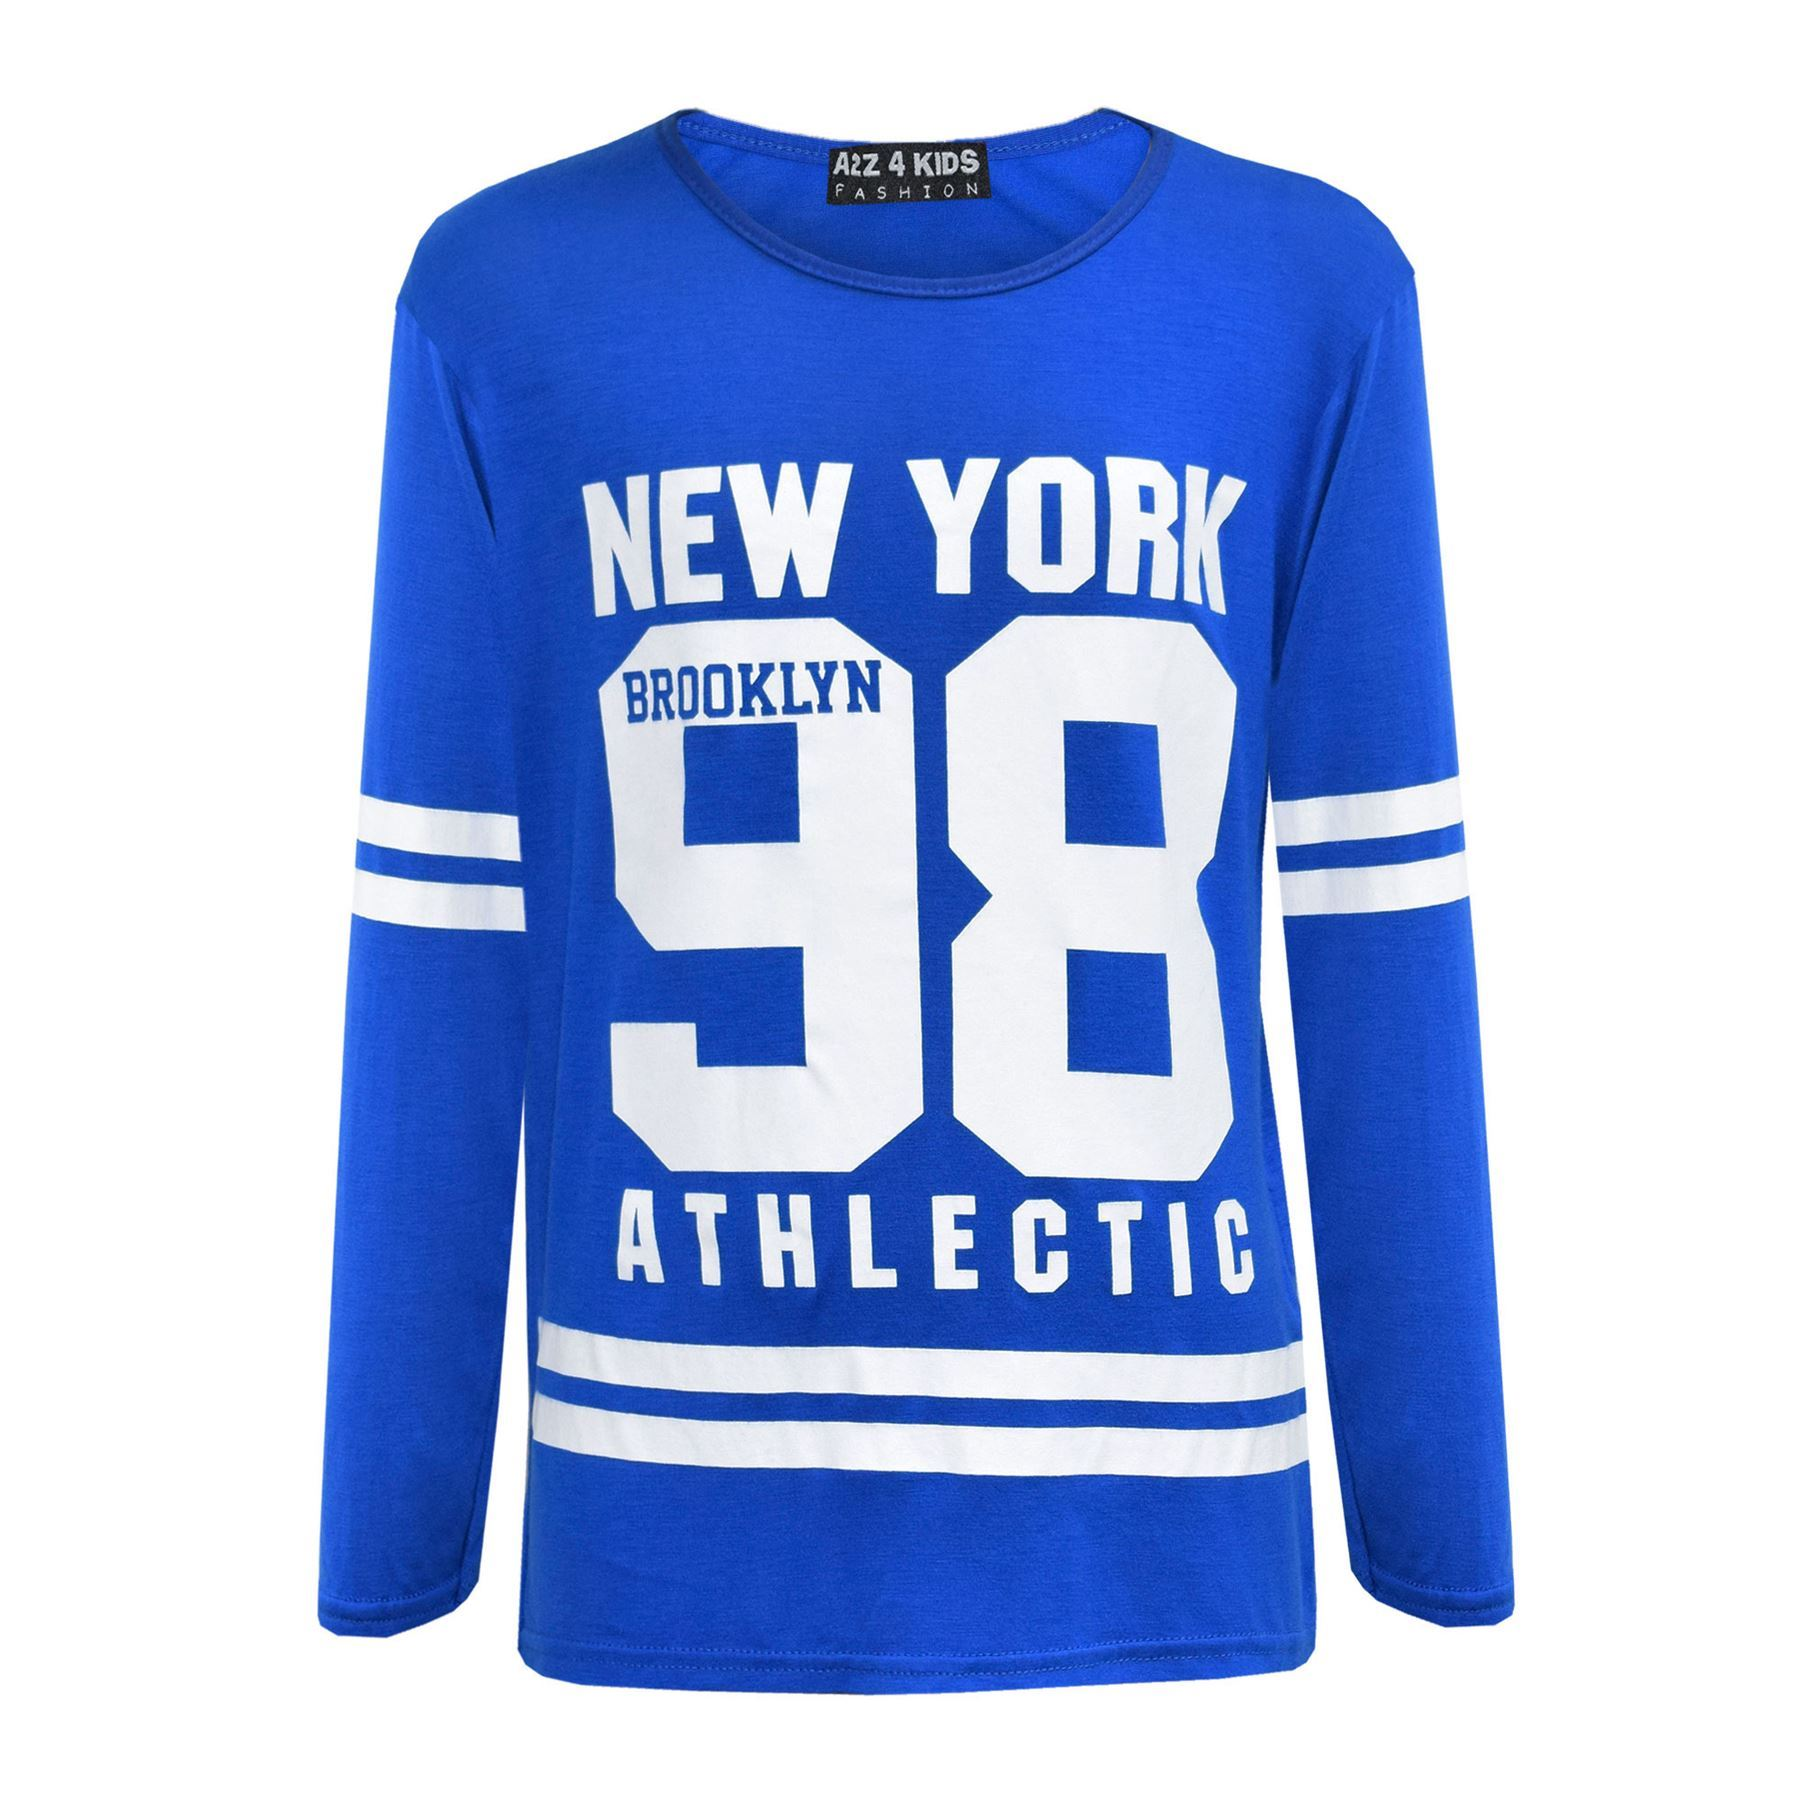 Girls-NEW-YORK-BROOKLYN-98-ATHLECTIC-Camouflage-Print-Top-amp-Legging-Set-7-13-Yr thumbnail 87